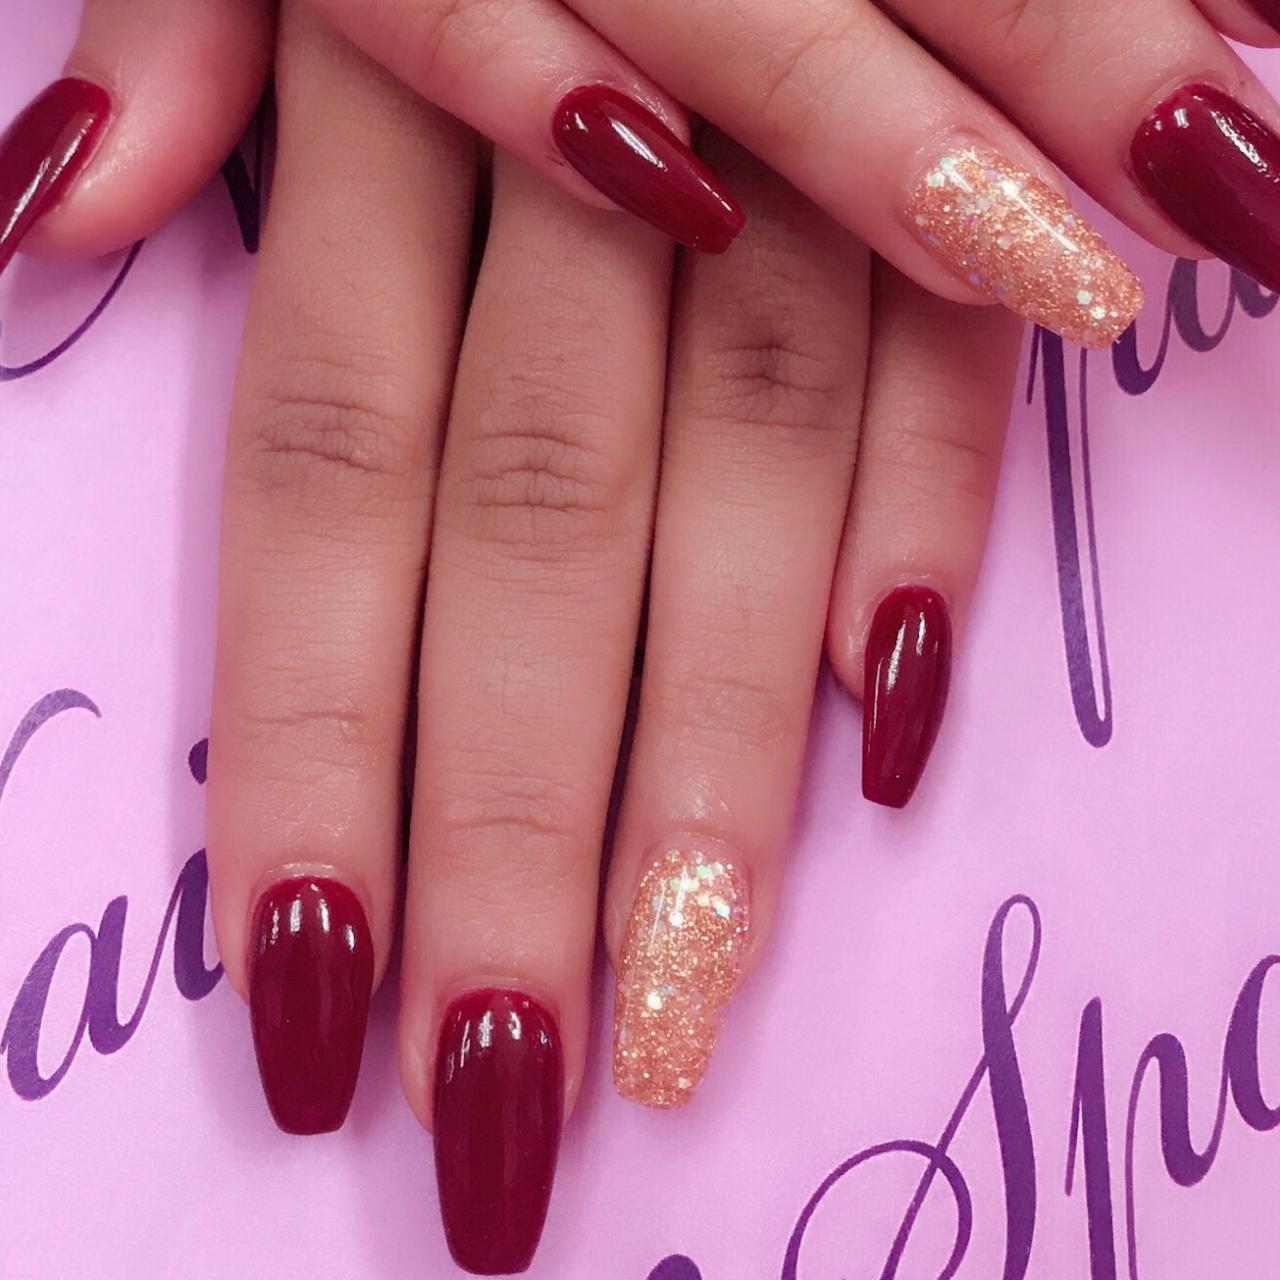 Bella Nails & Spas - Nail Salon in Riverside